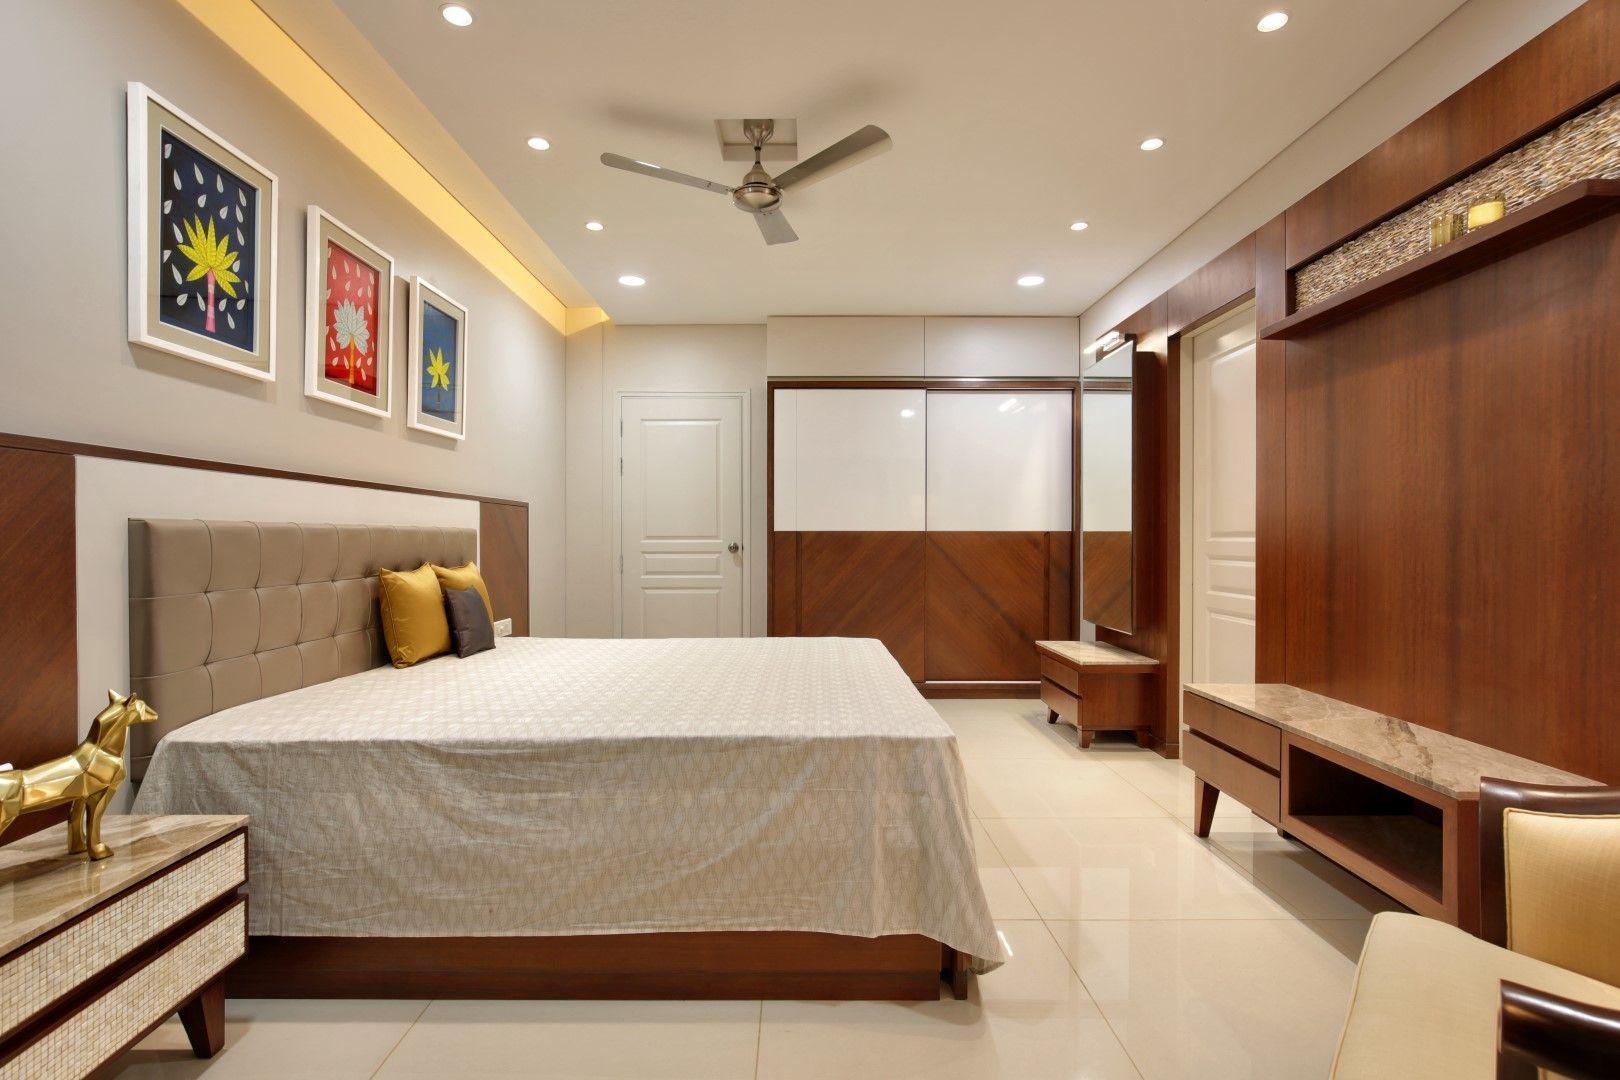 3 Bhk Flat Interiors The Oak Woods Bedroom False Ceiling